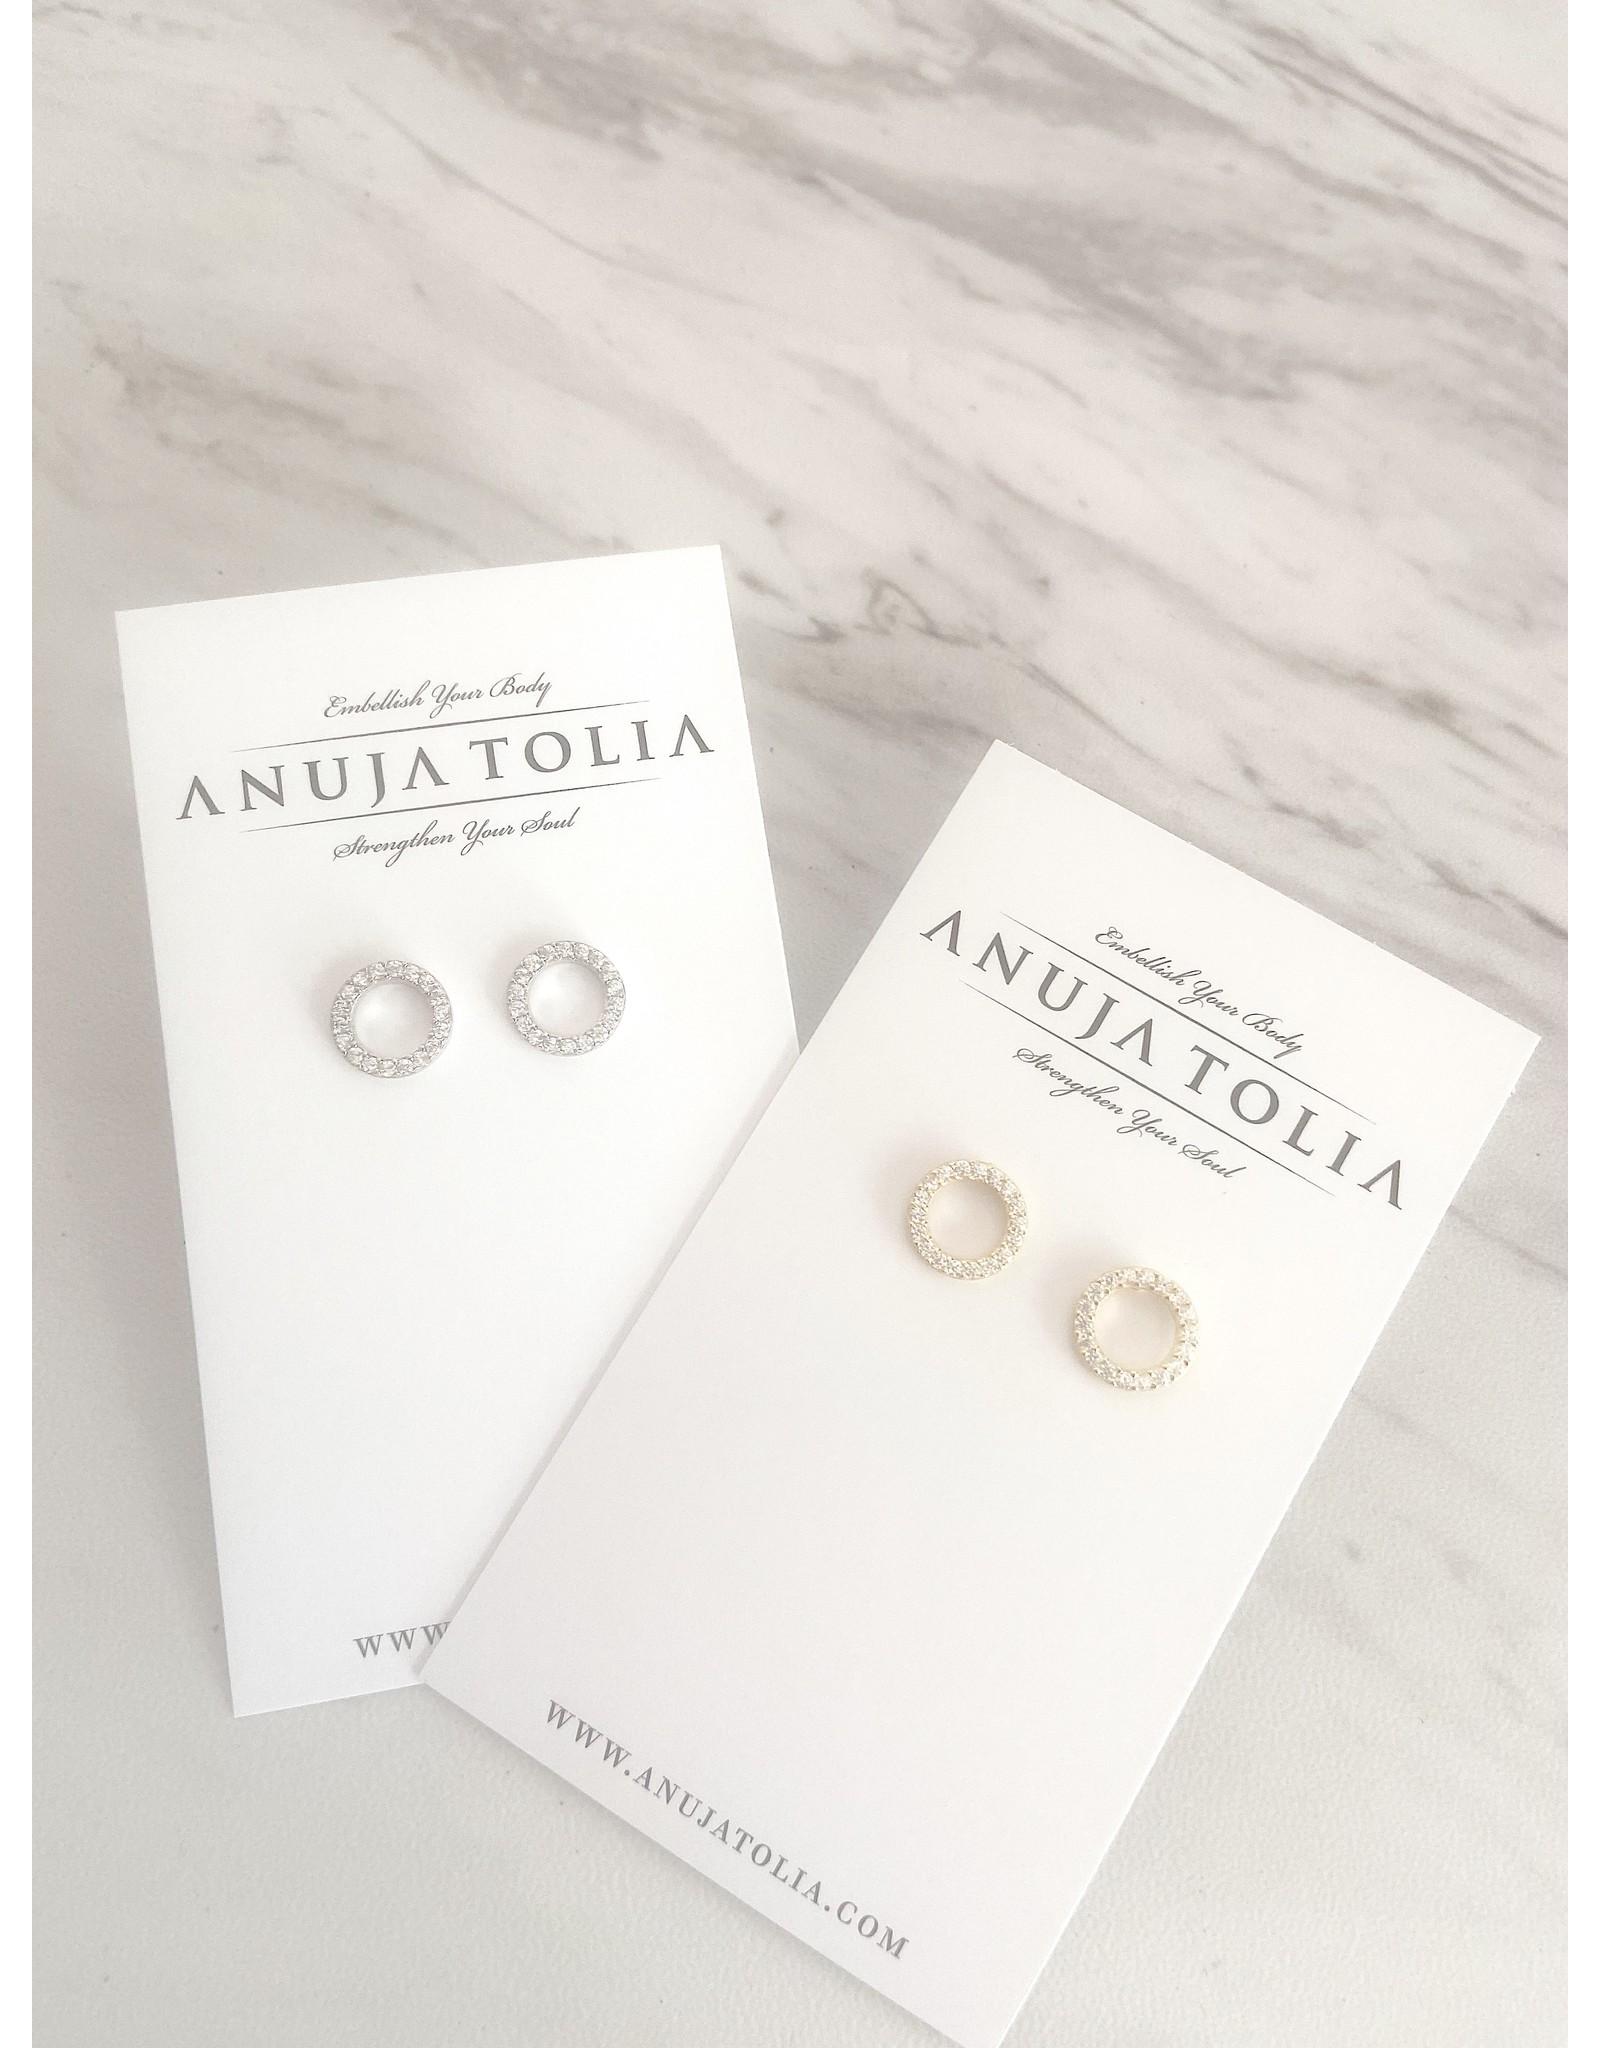 ANOUJA TOLIA OPEN CIRCLE EARRING